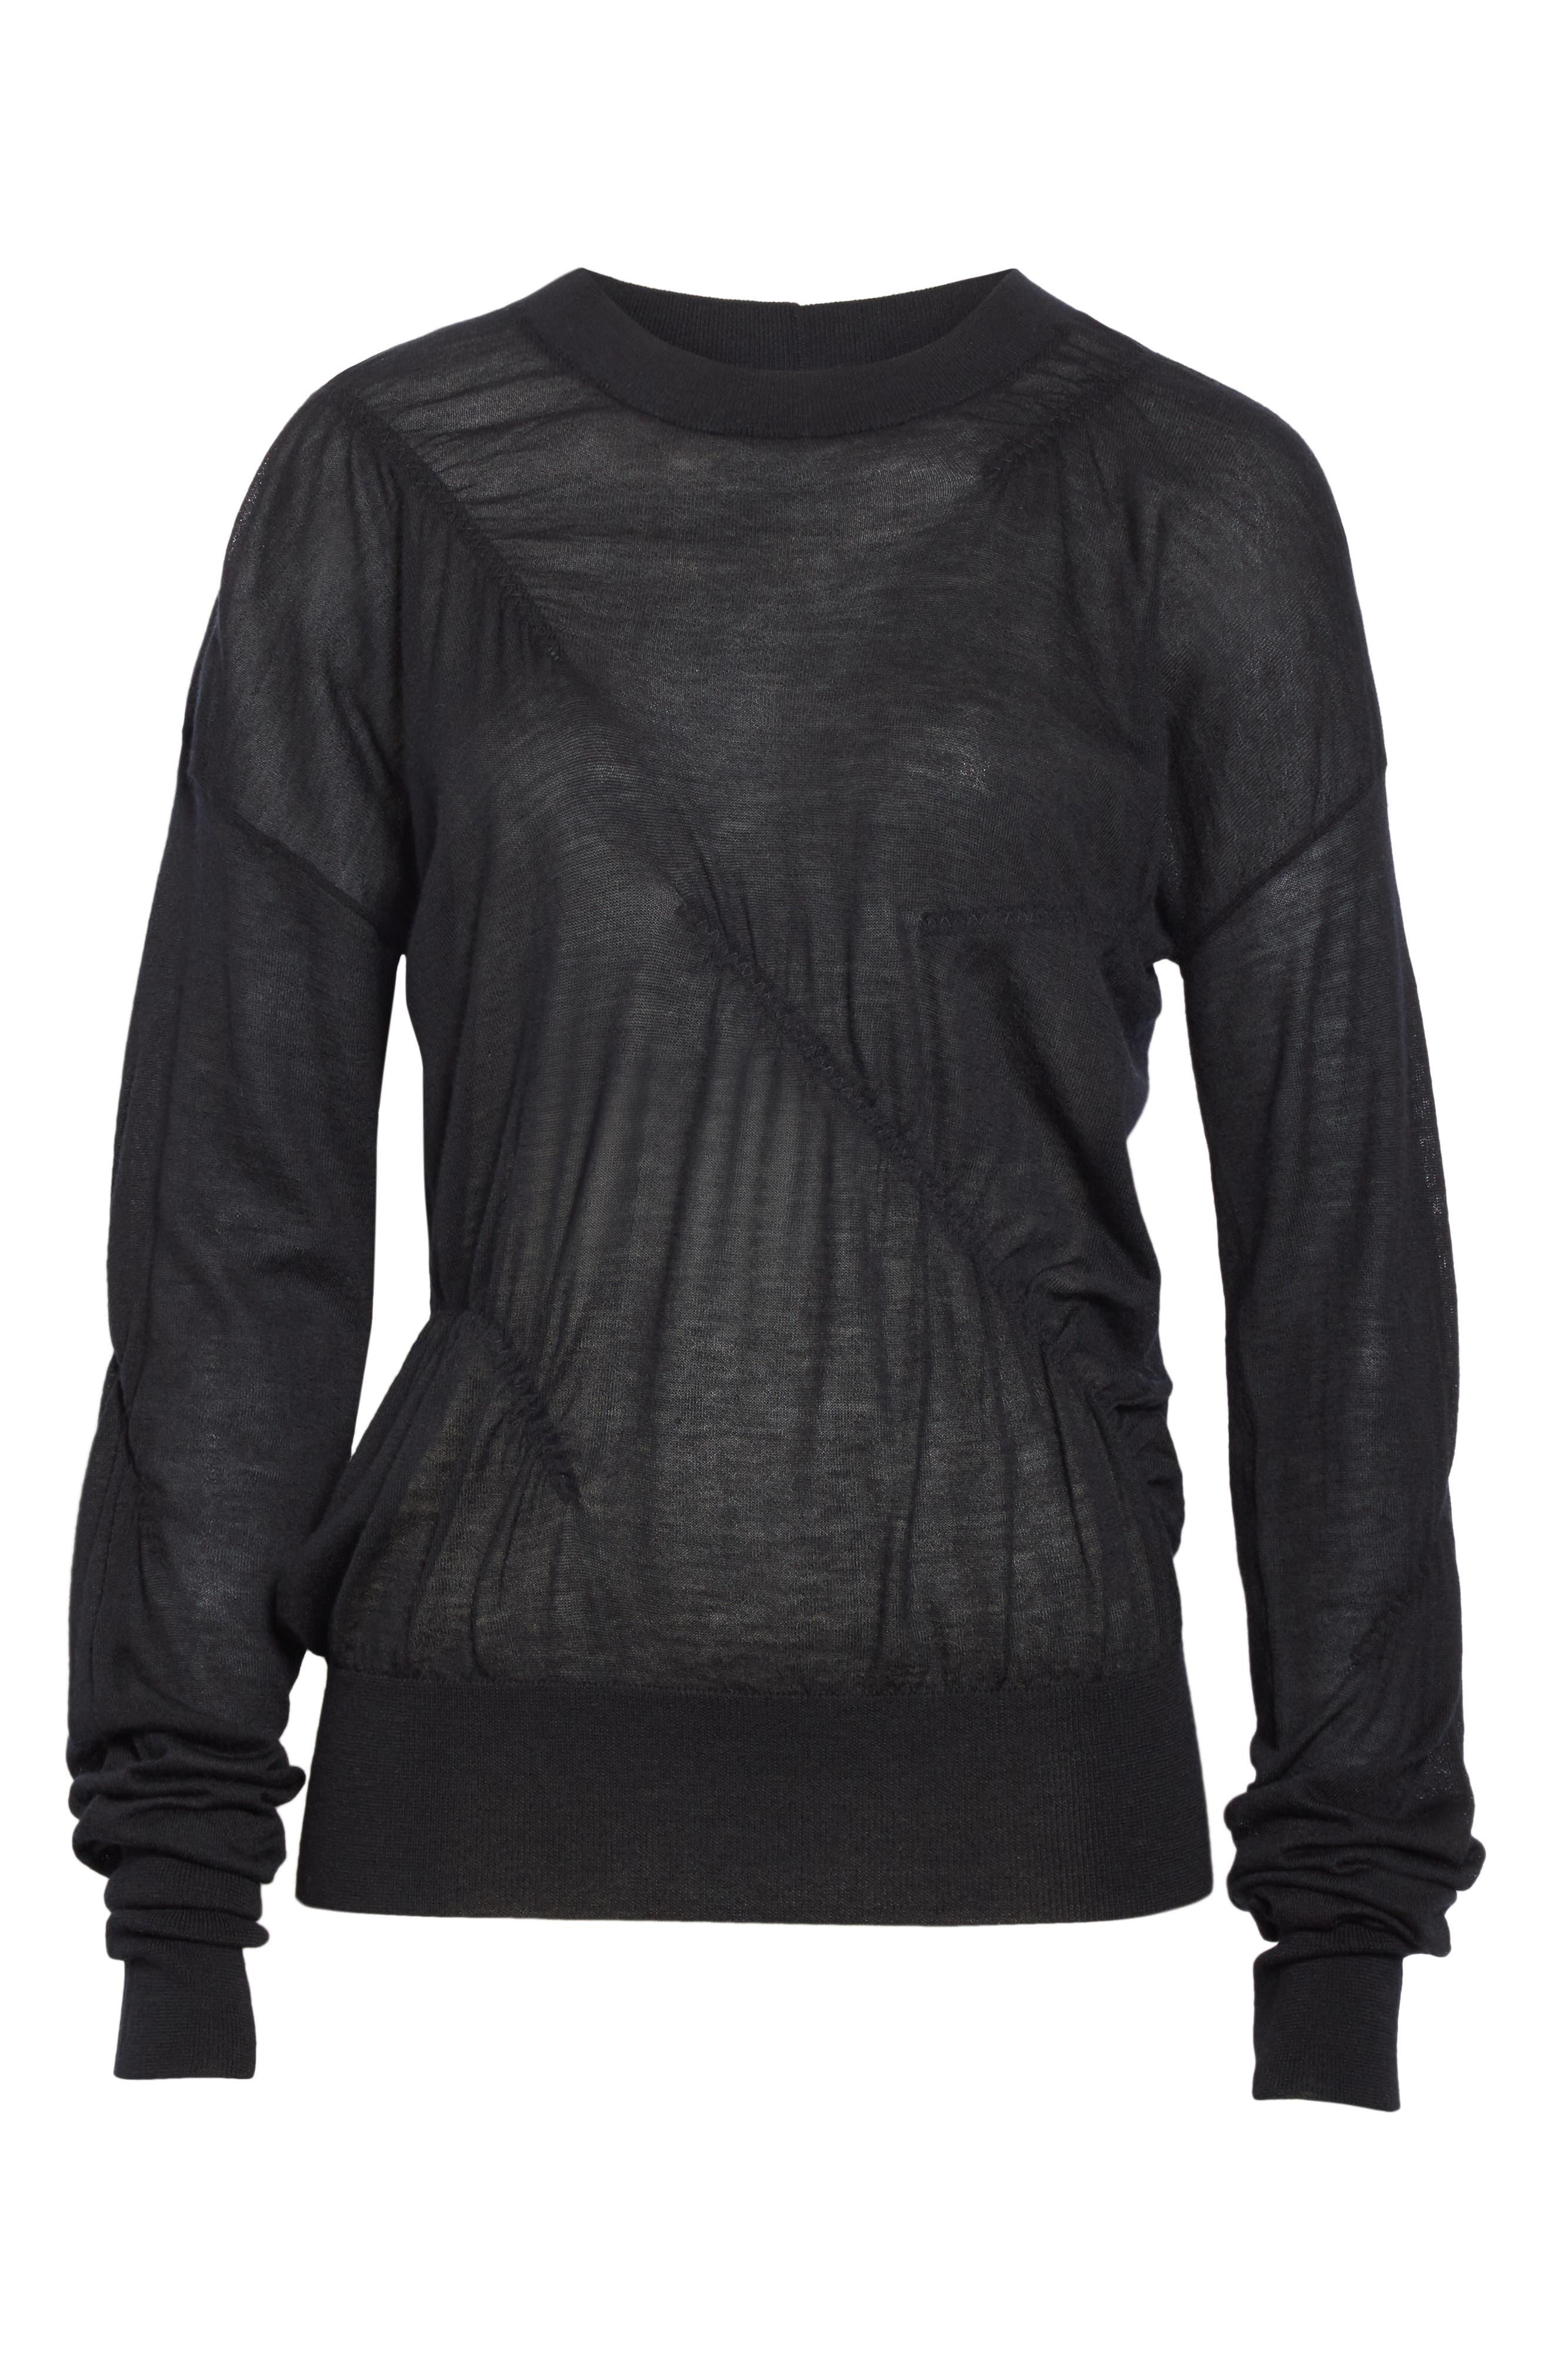 HELMUT LANG, Ruched Seam Detail Cashmere Sweater, Alternate thumbnail 6, color, BLACK